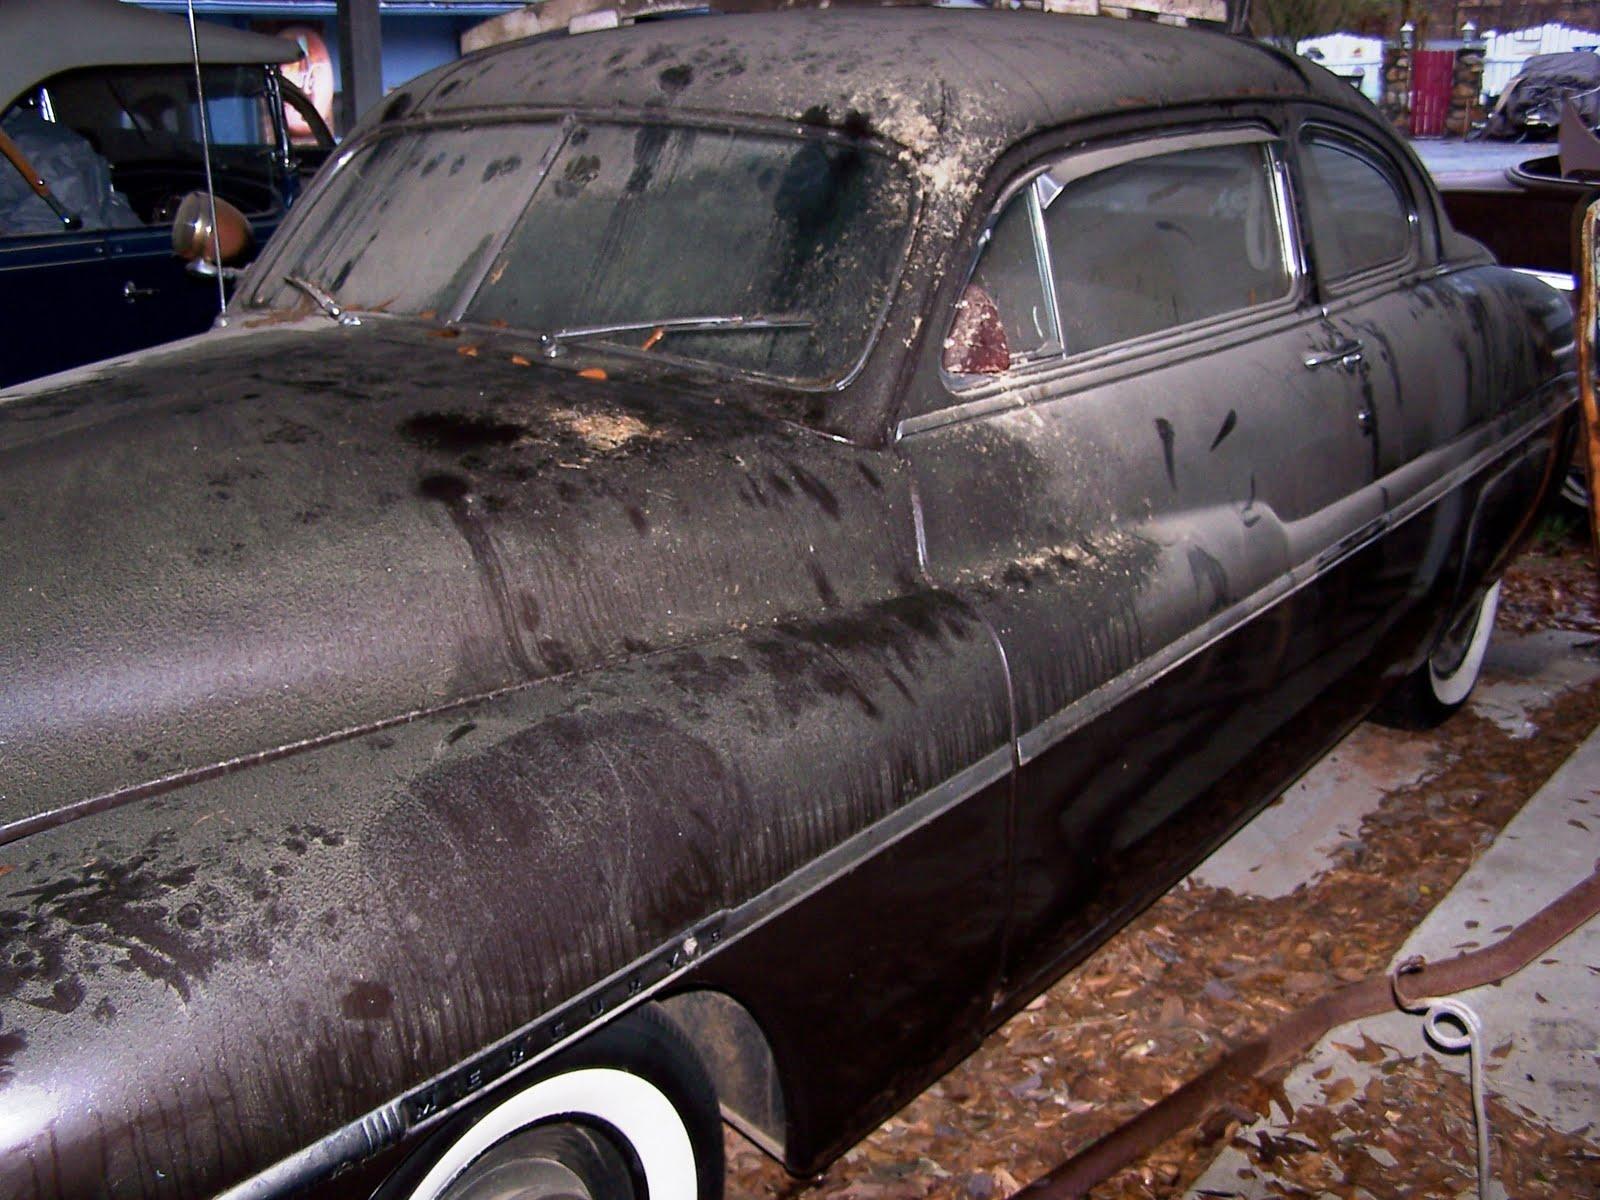 1950 Mercury as found